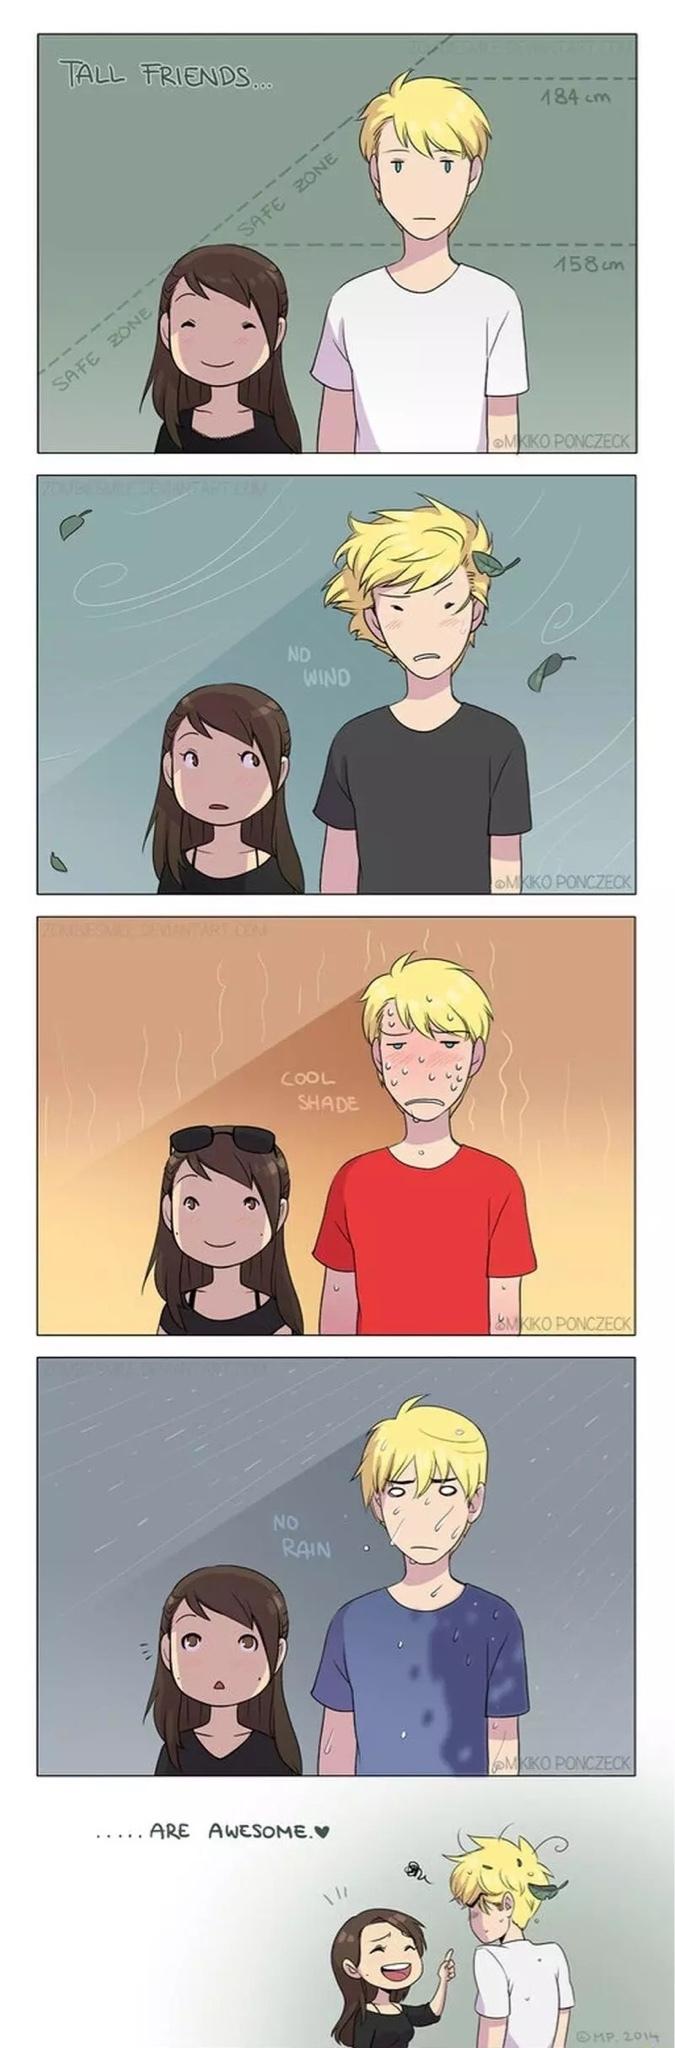 tall friends - meme